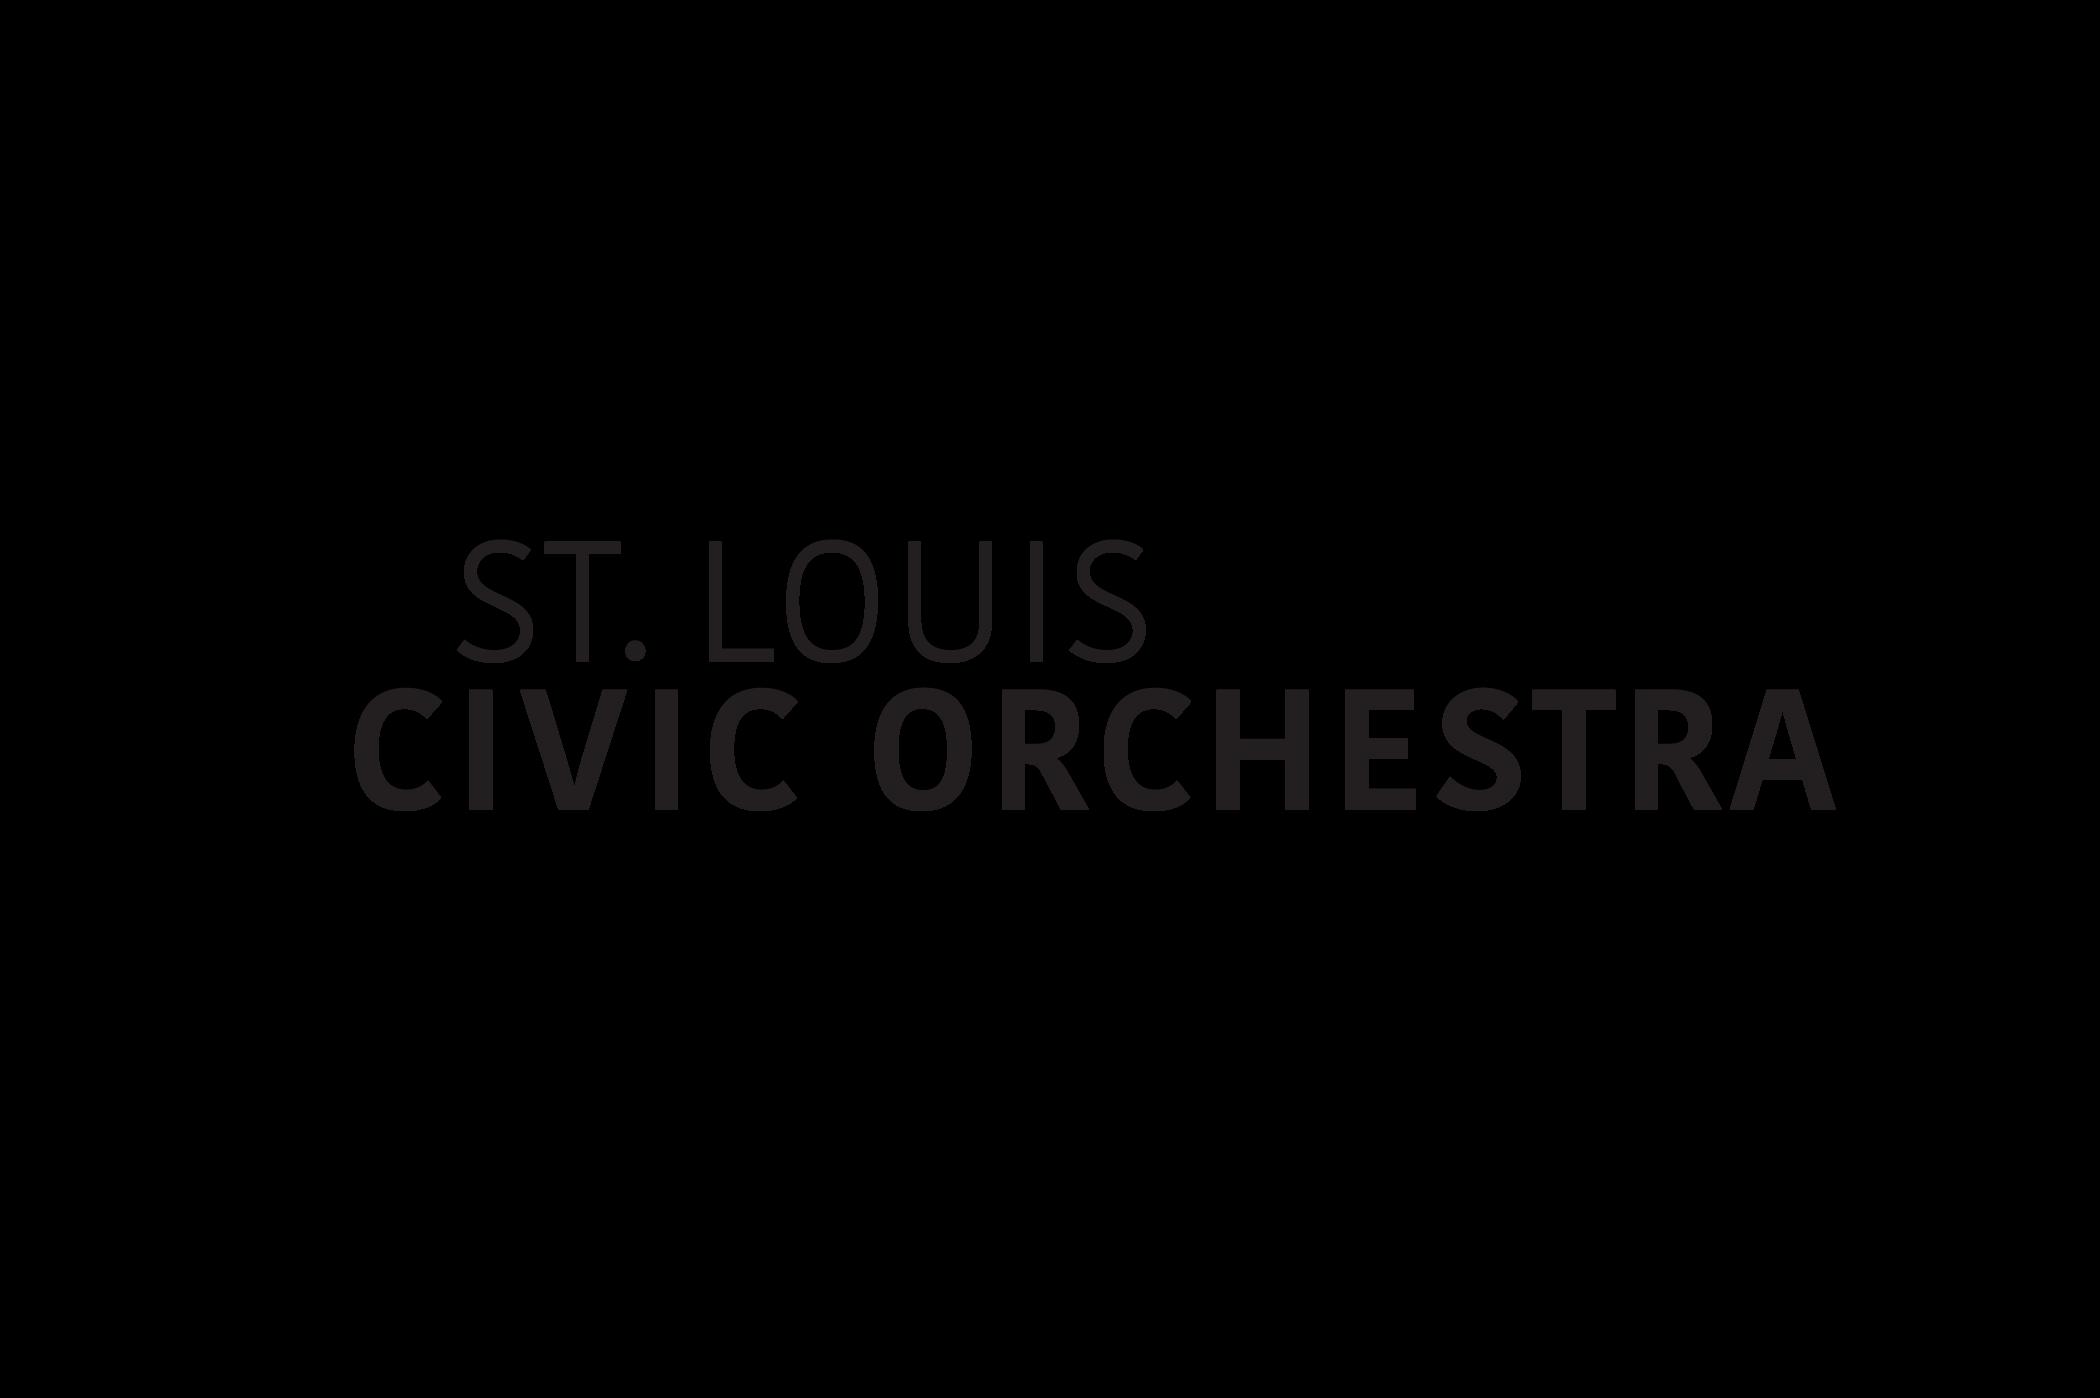 St. Louis Civic Orchestra